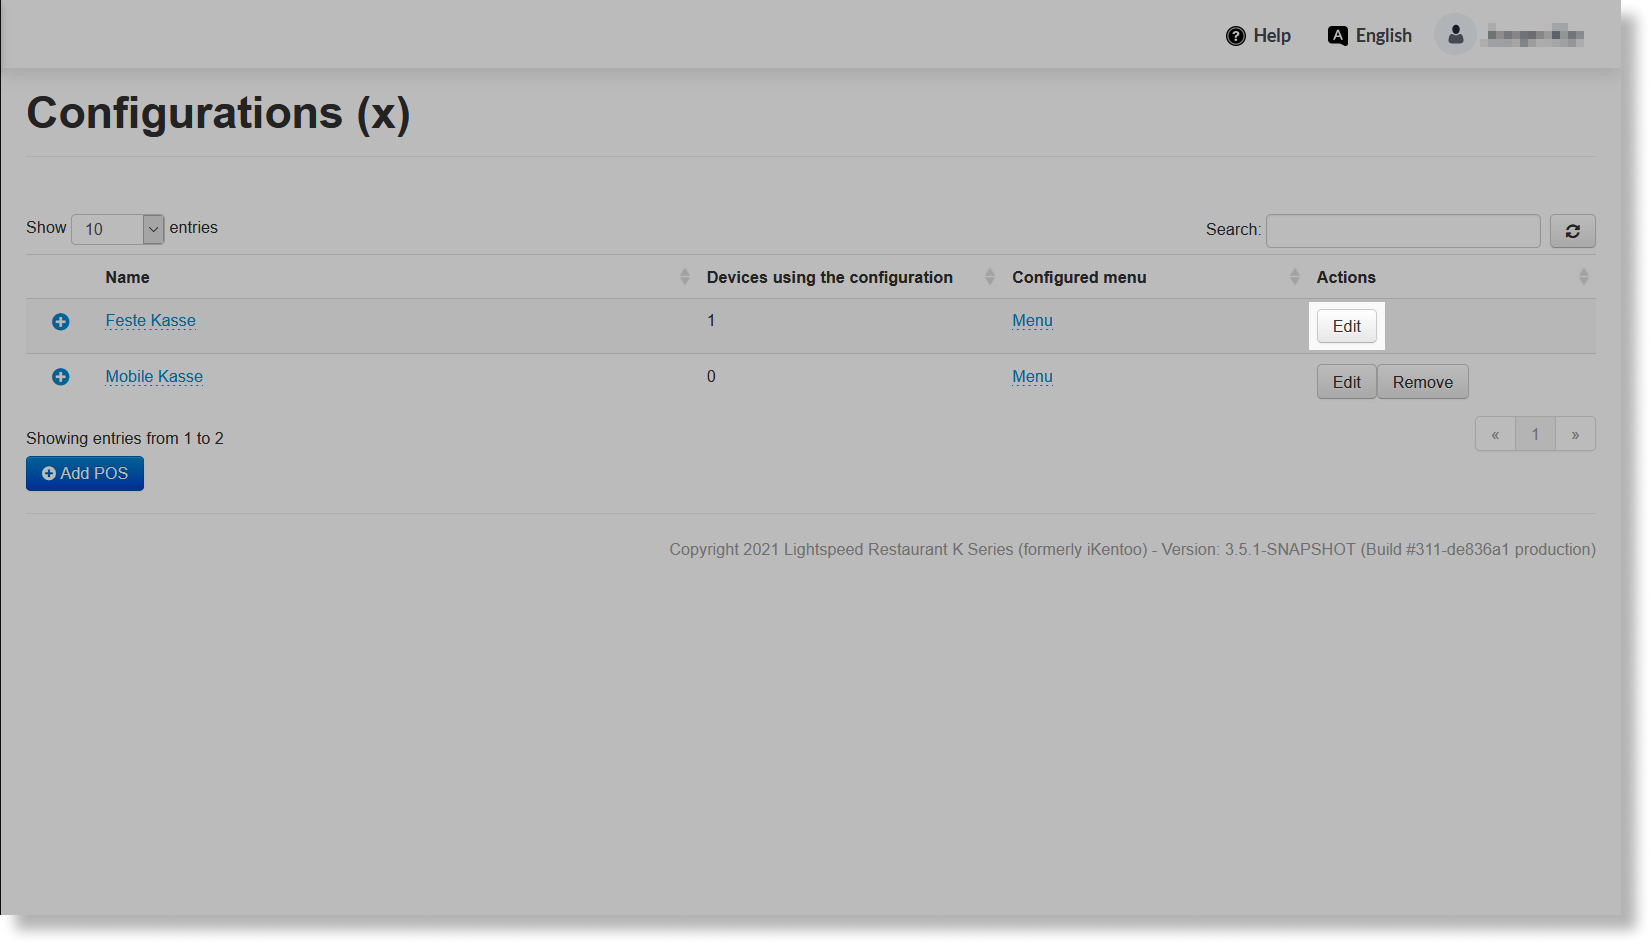 lsk-configuration-configuration-edit-marked-wds.png